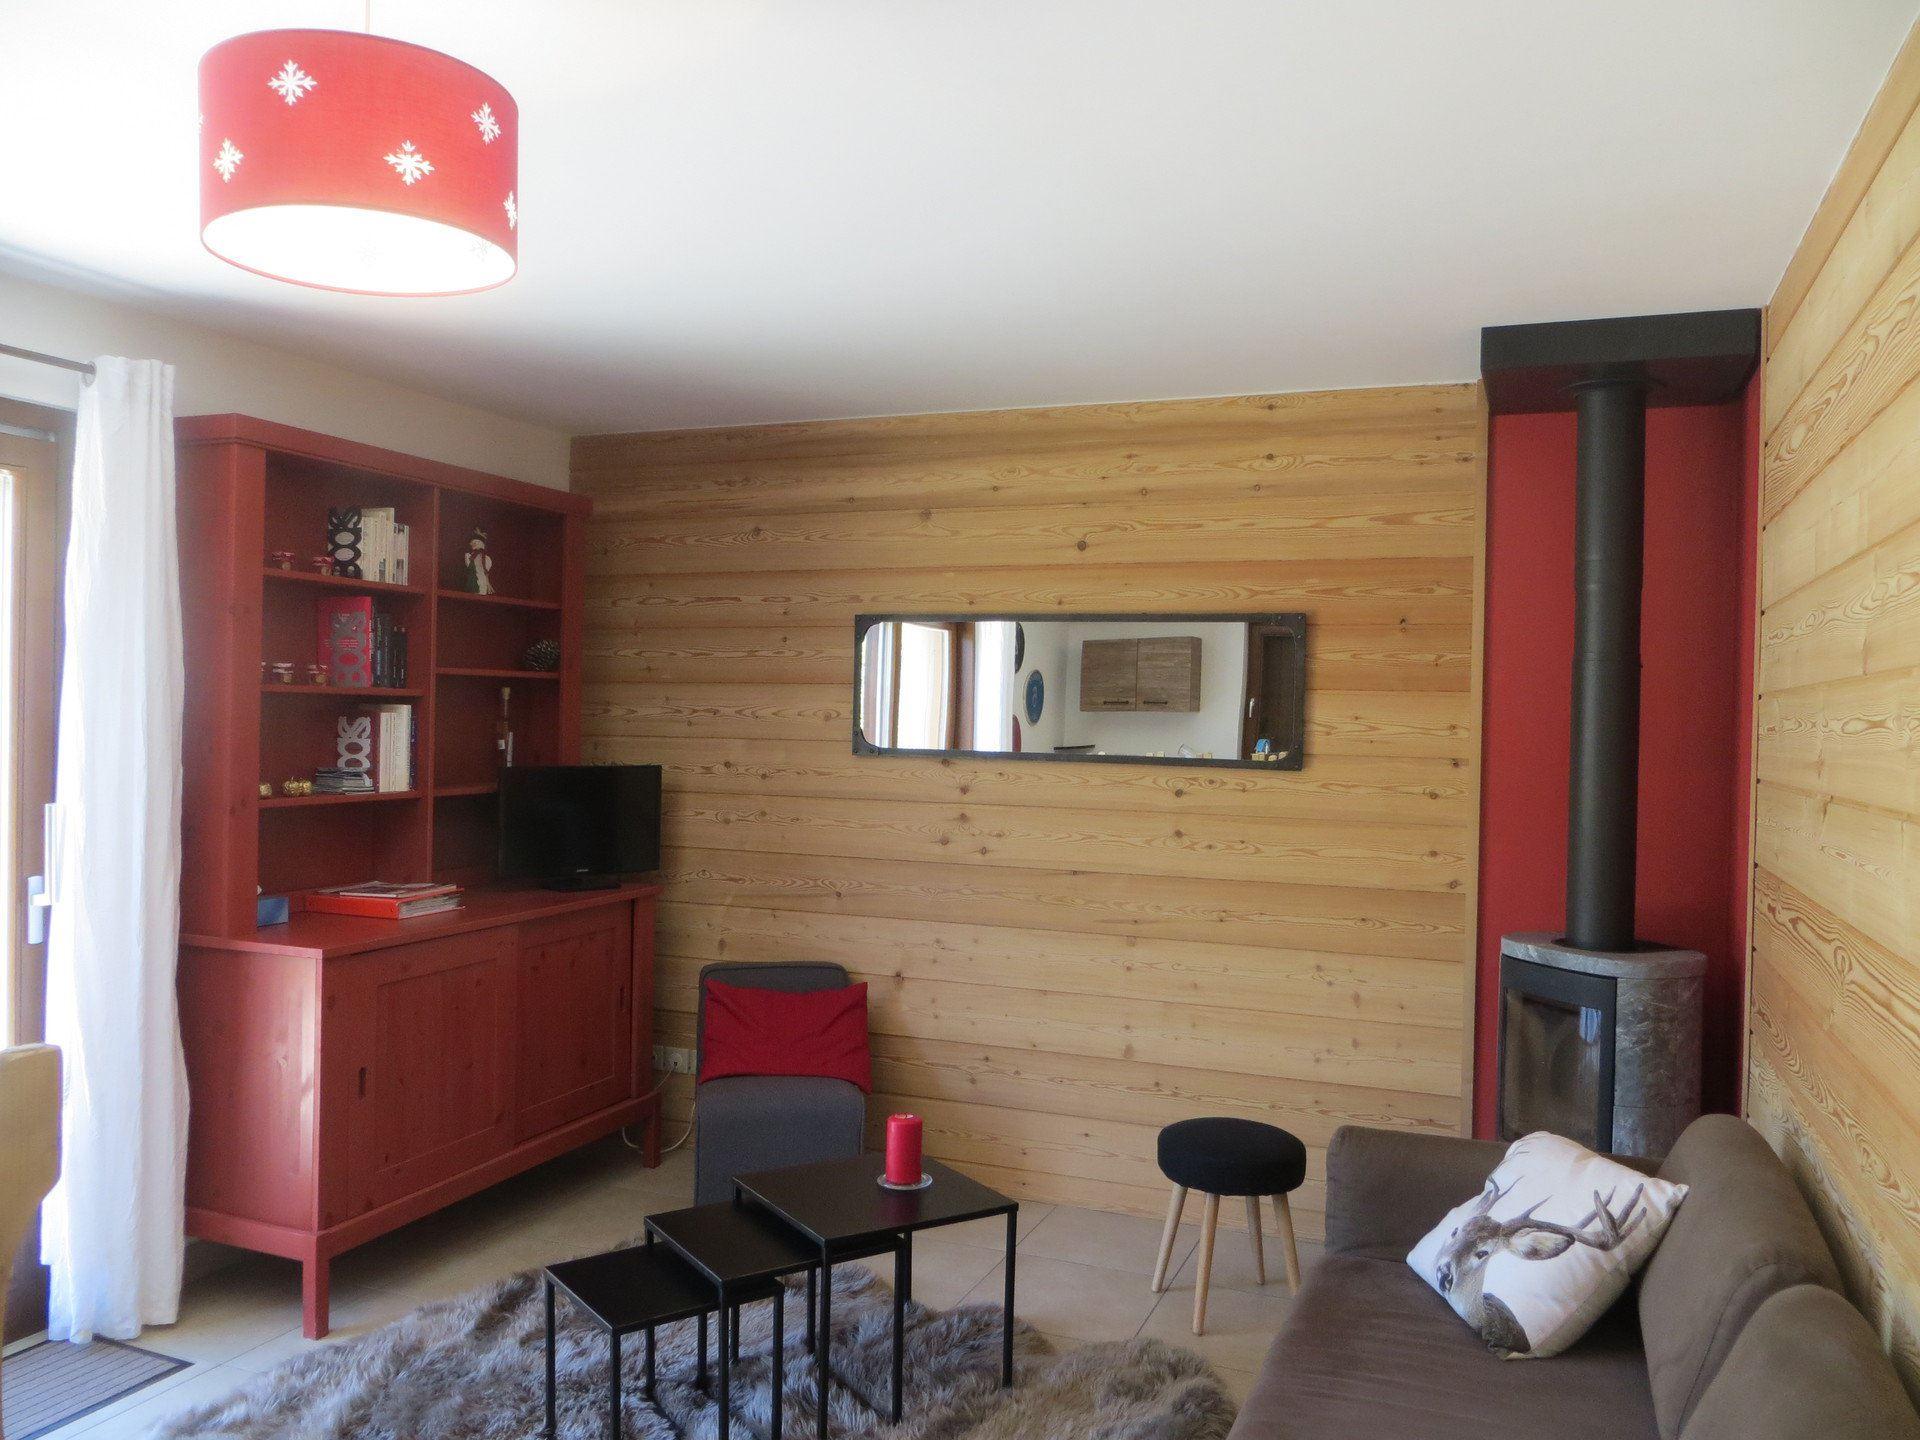 Délys - LB313 - 3 rooms - not classified - 6 people - 65 m2